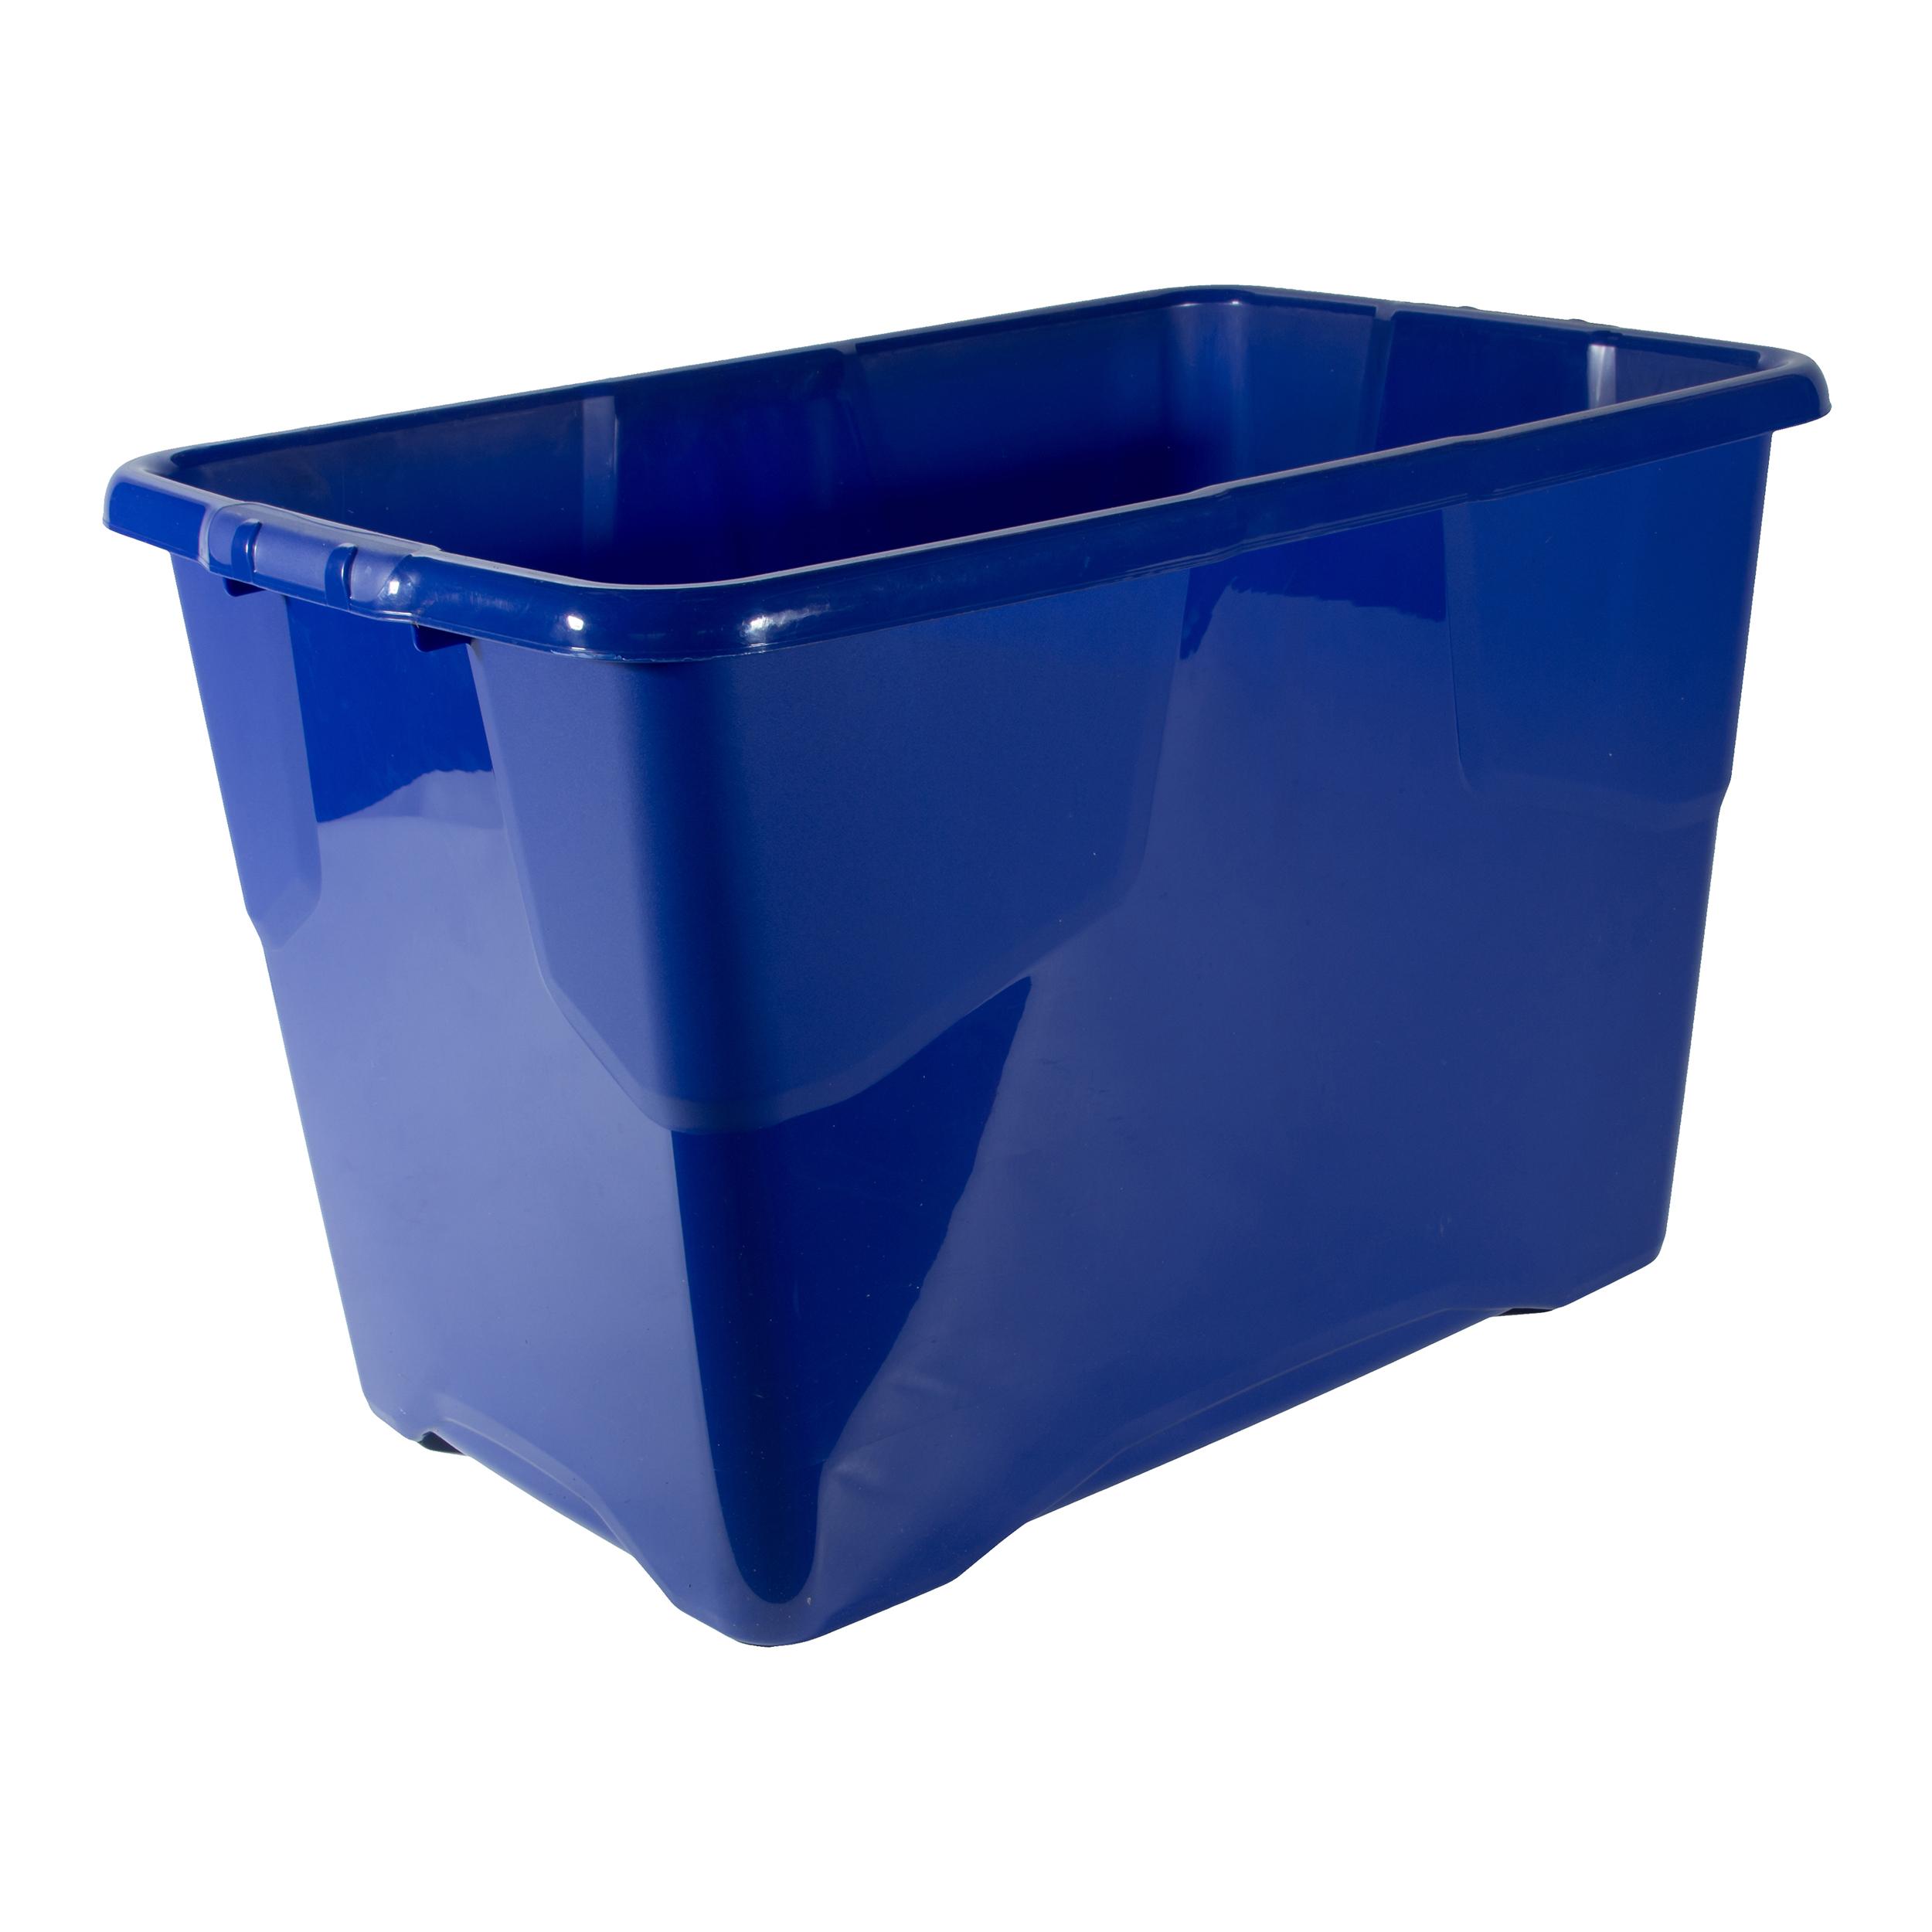 Tool Boxes Strata Curve Box 65 Litre Blue ref XW203B-LBL